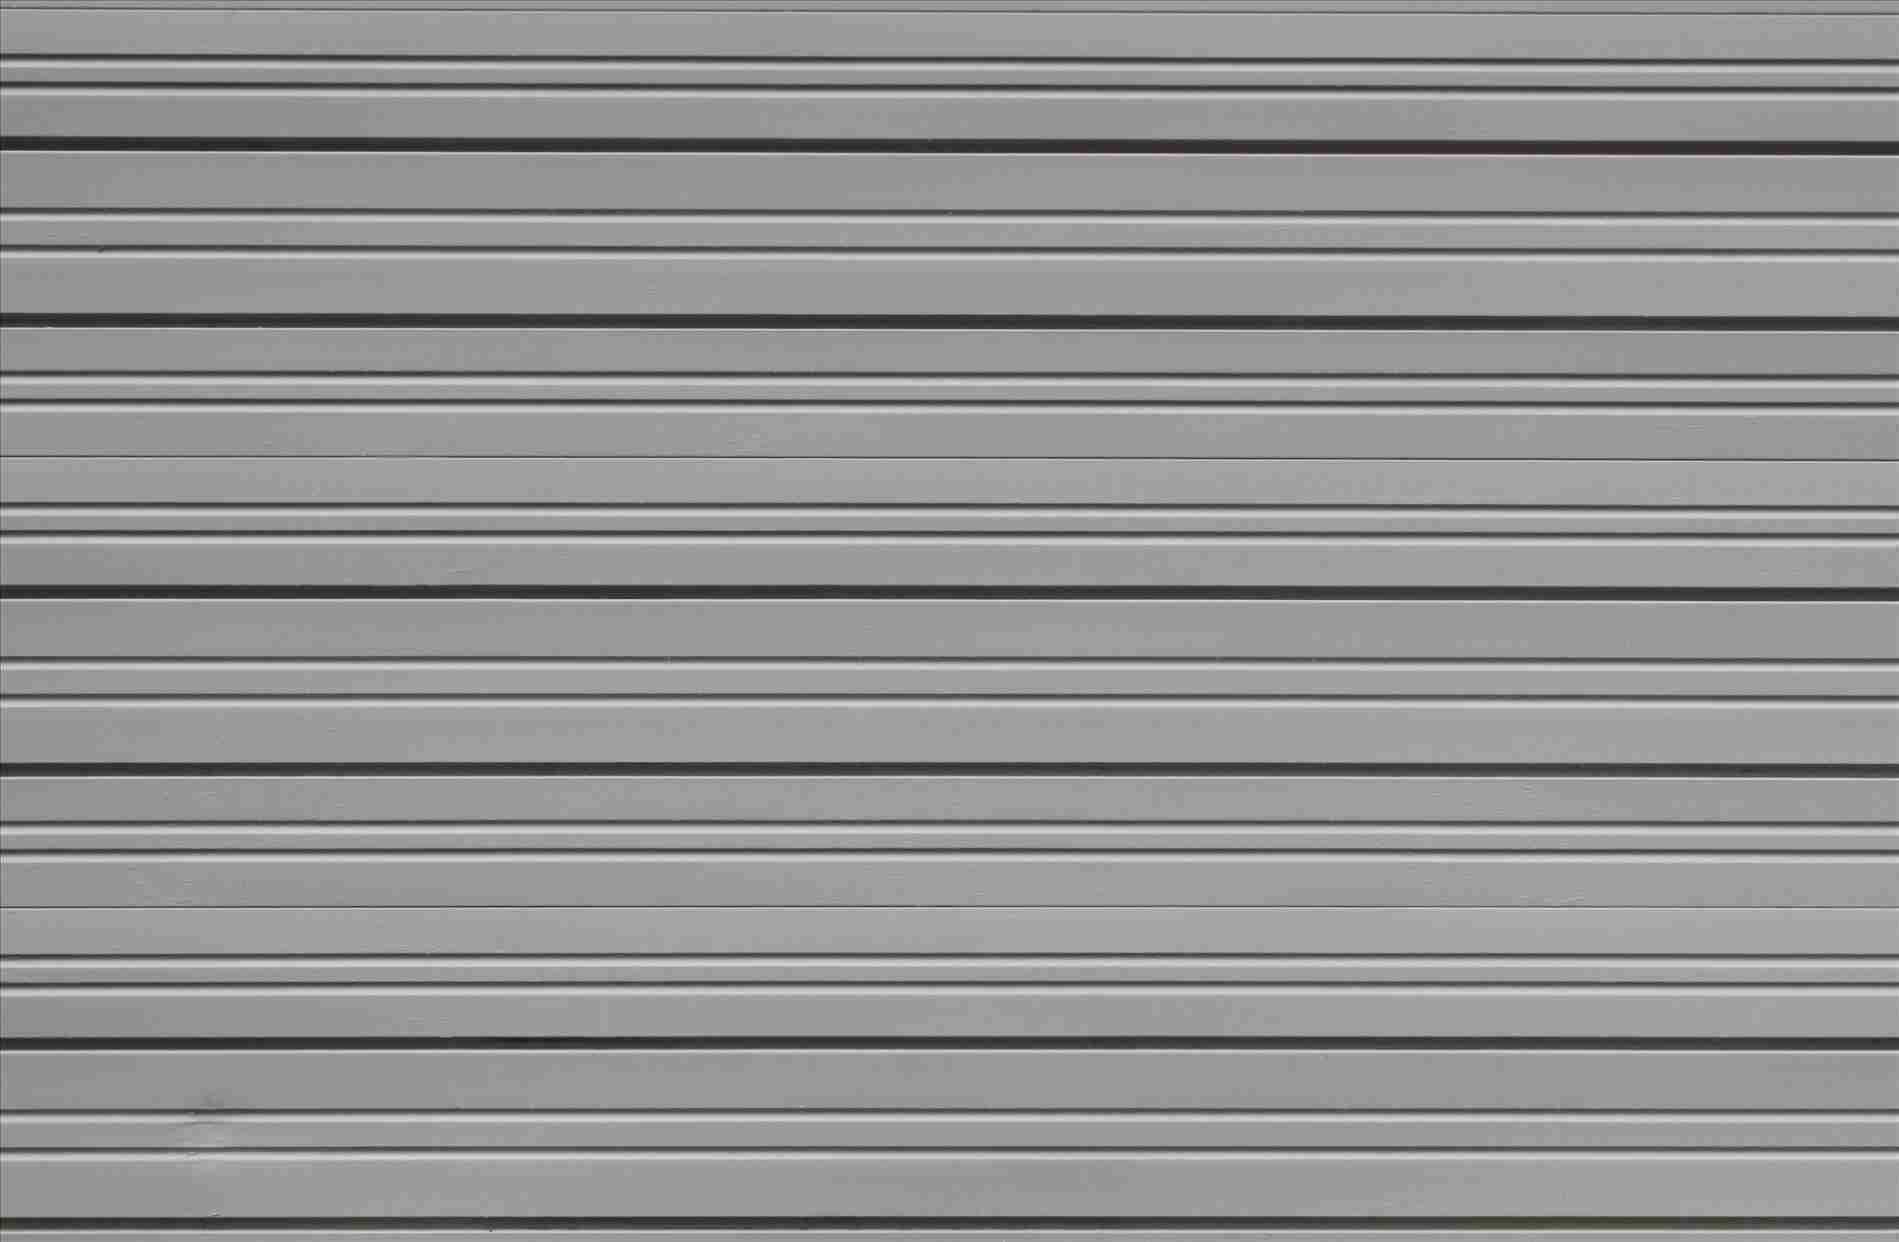 Corrugated Metal Panel Texture Aluminum Roof Corrugated Metal Metal Panels